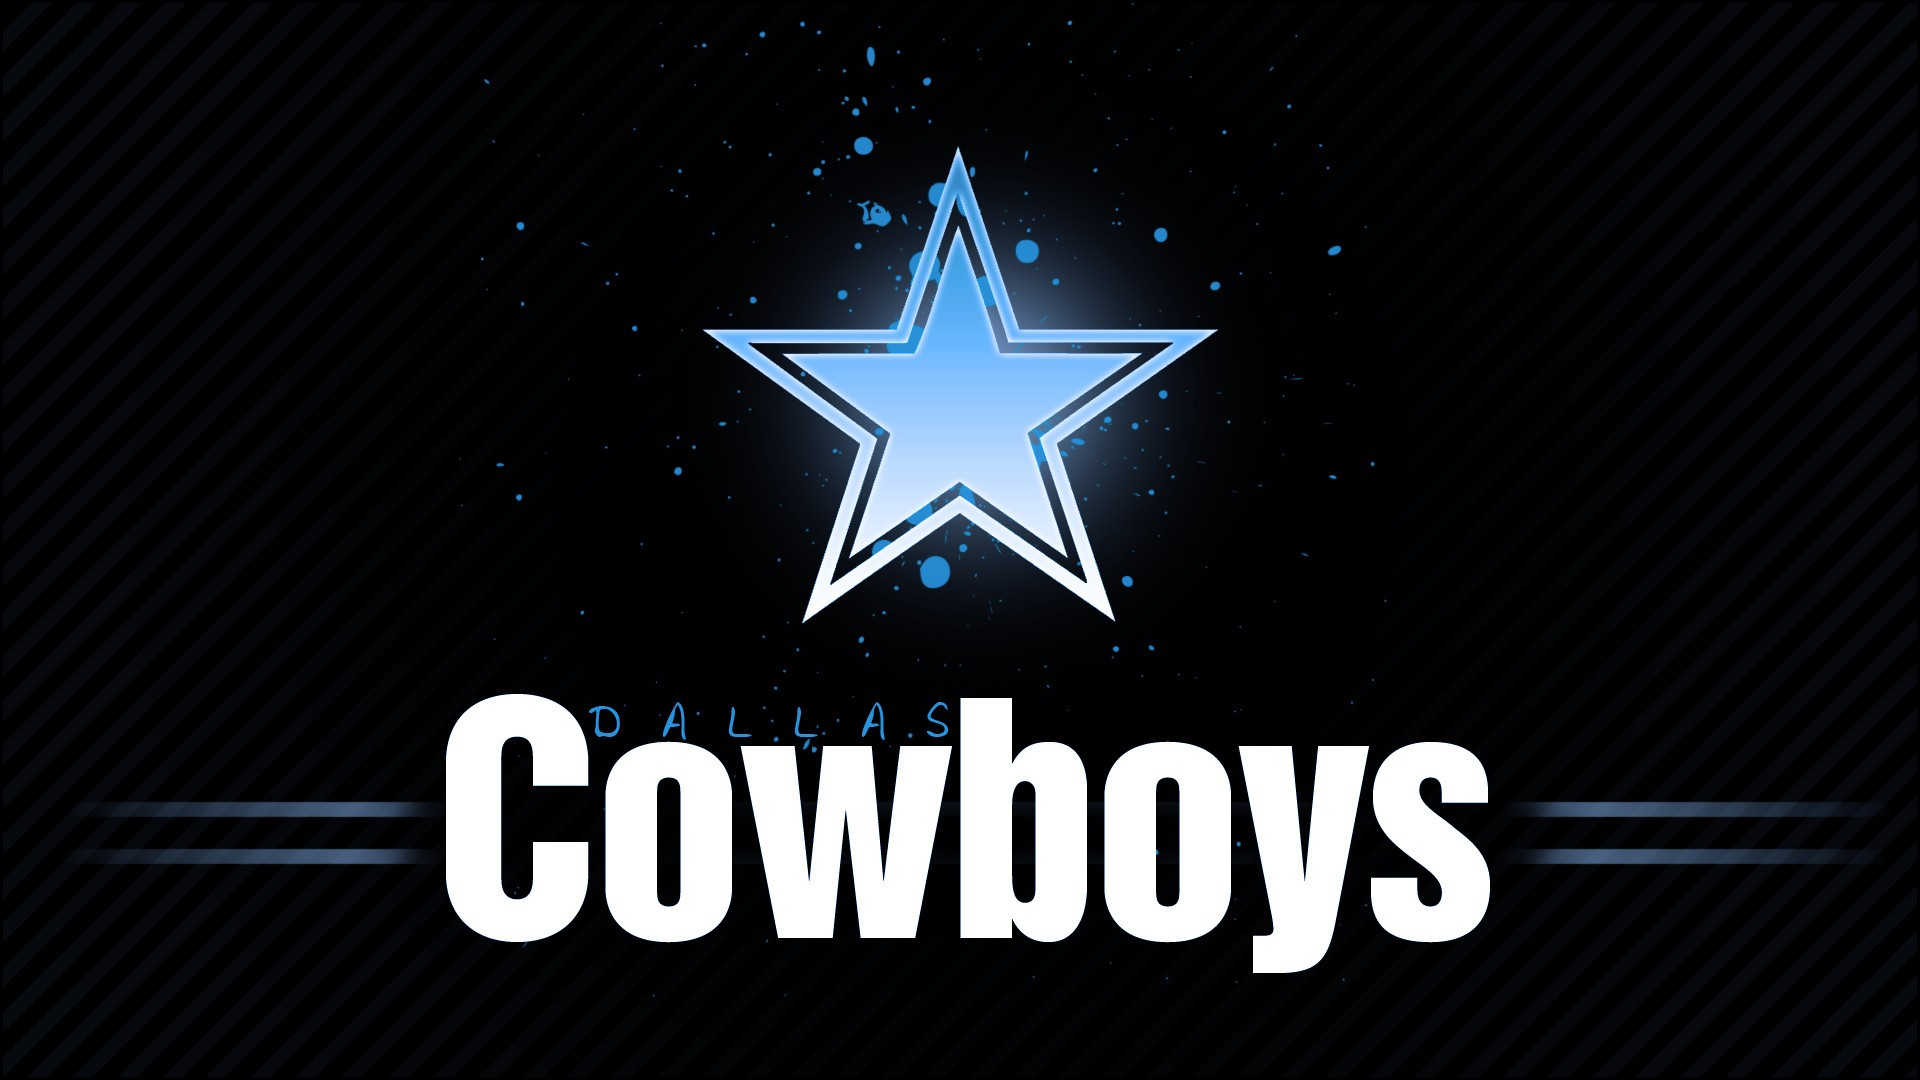 Light Dallas Cowboys Logo Wallpaper HD Background Wallpapers 1920x1080